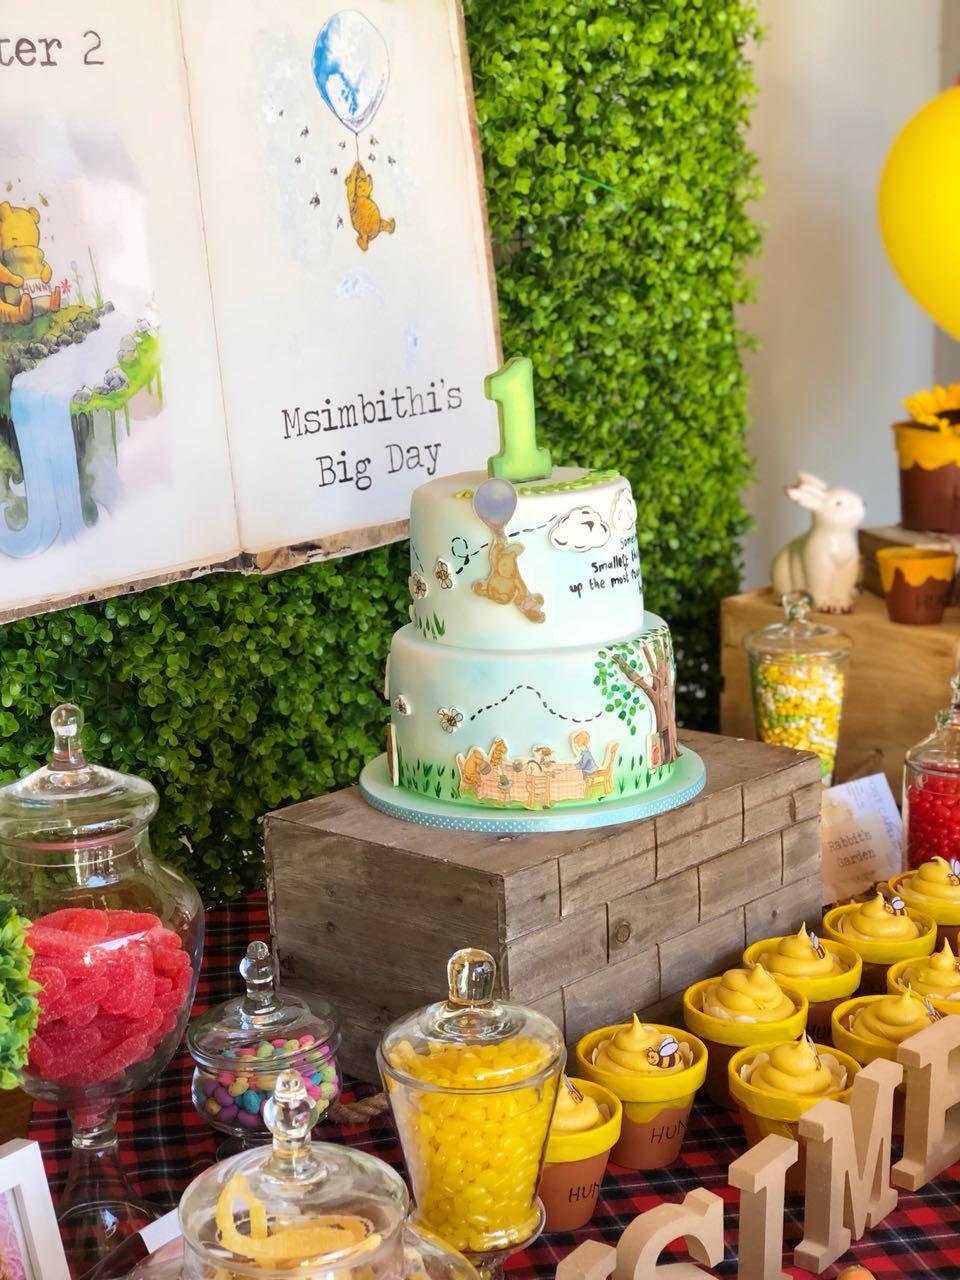 Birthday cakes and celebration cakes